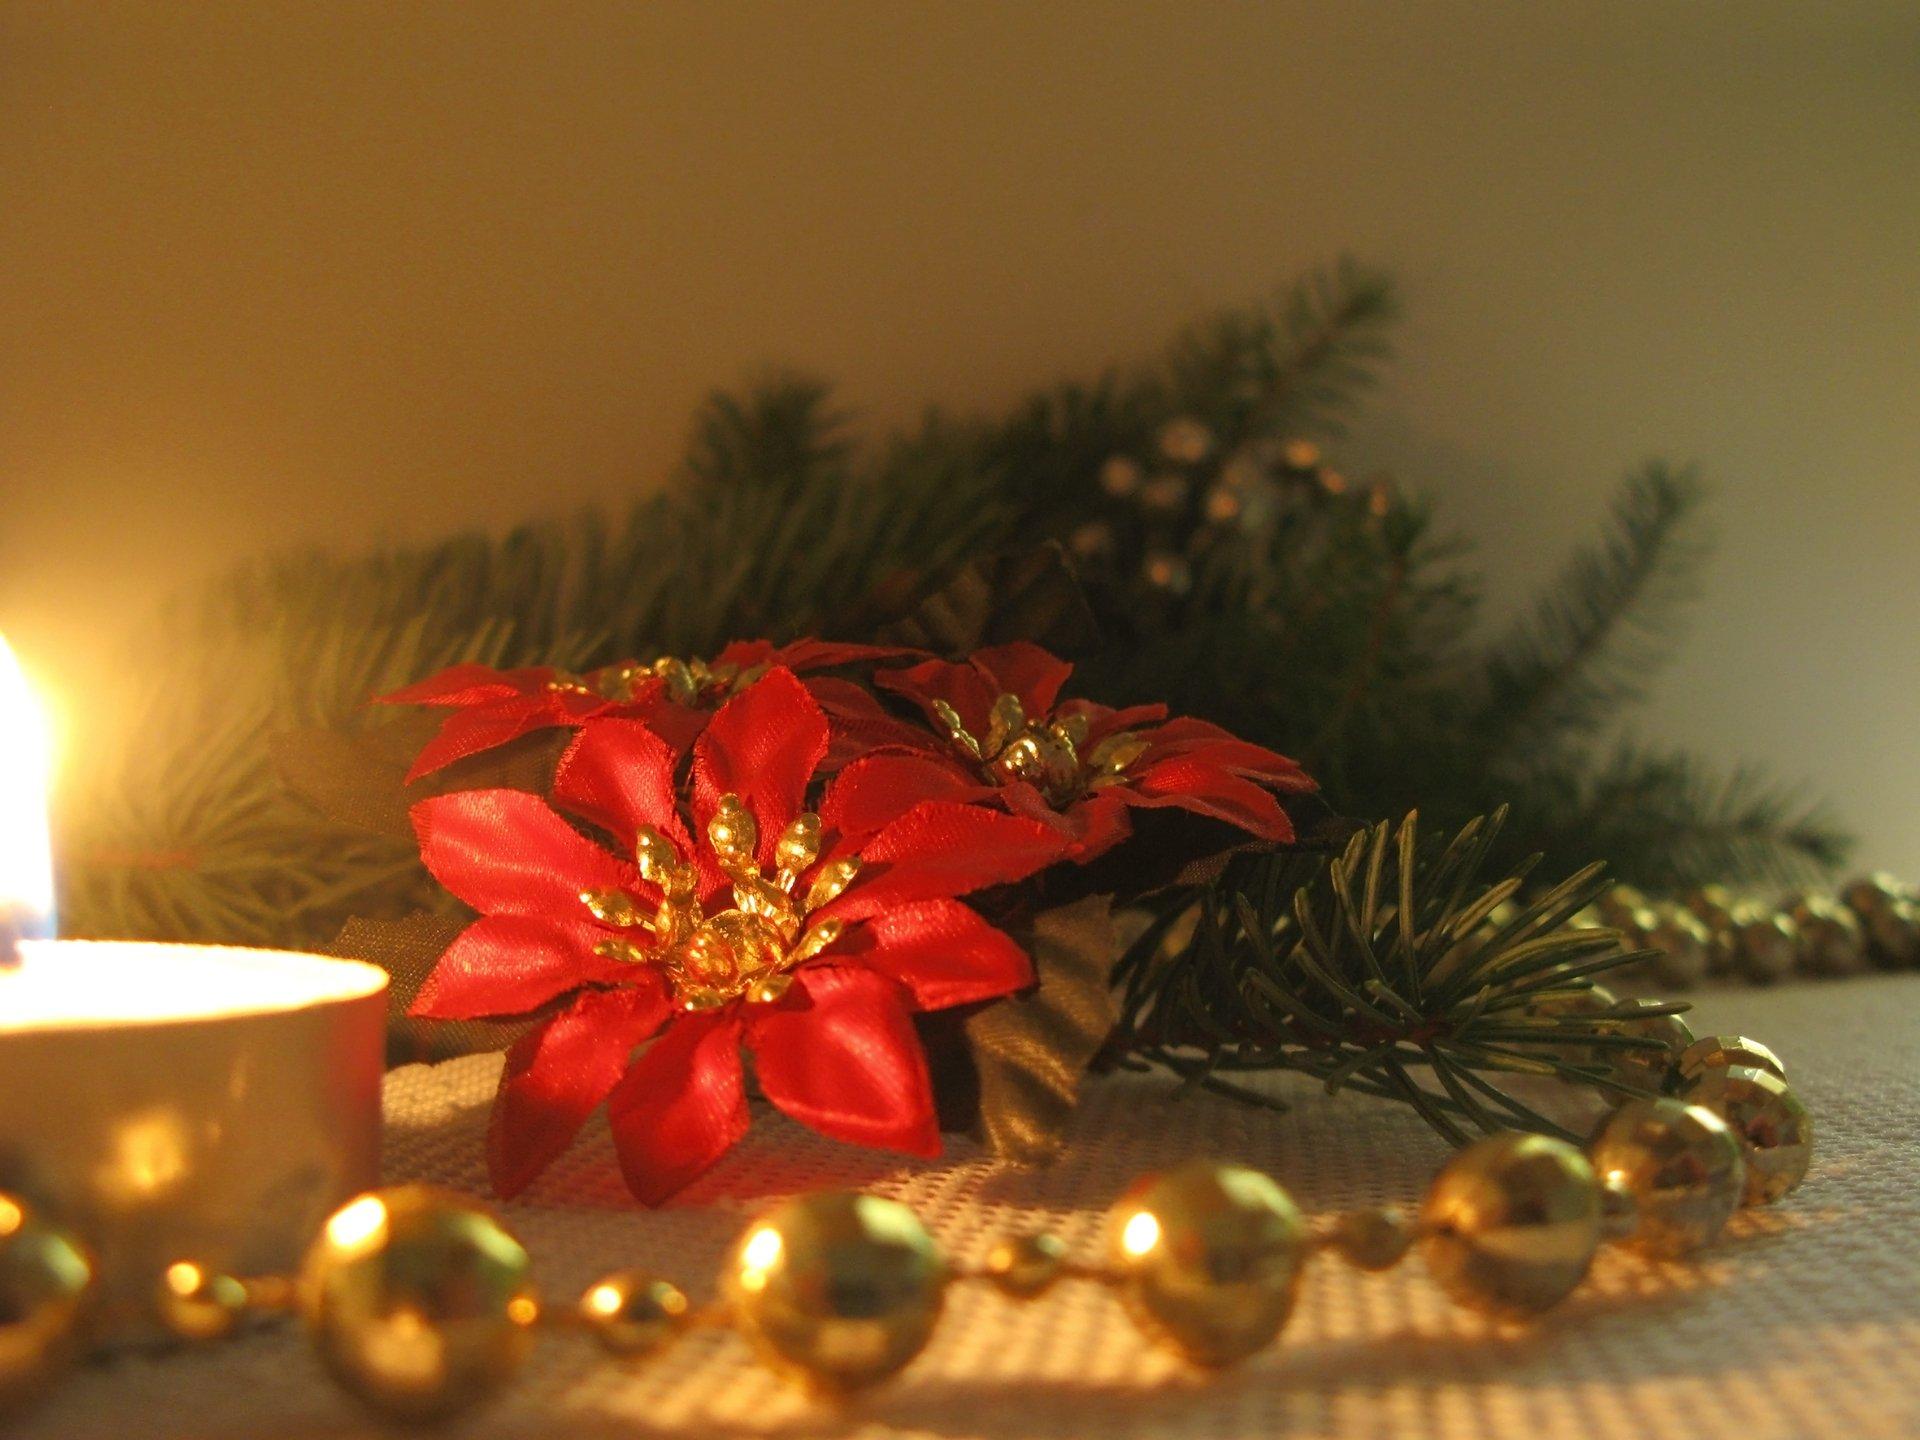 Floral elegance for the festive season